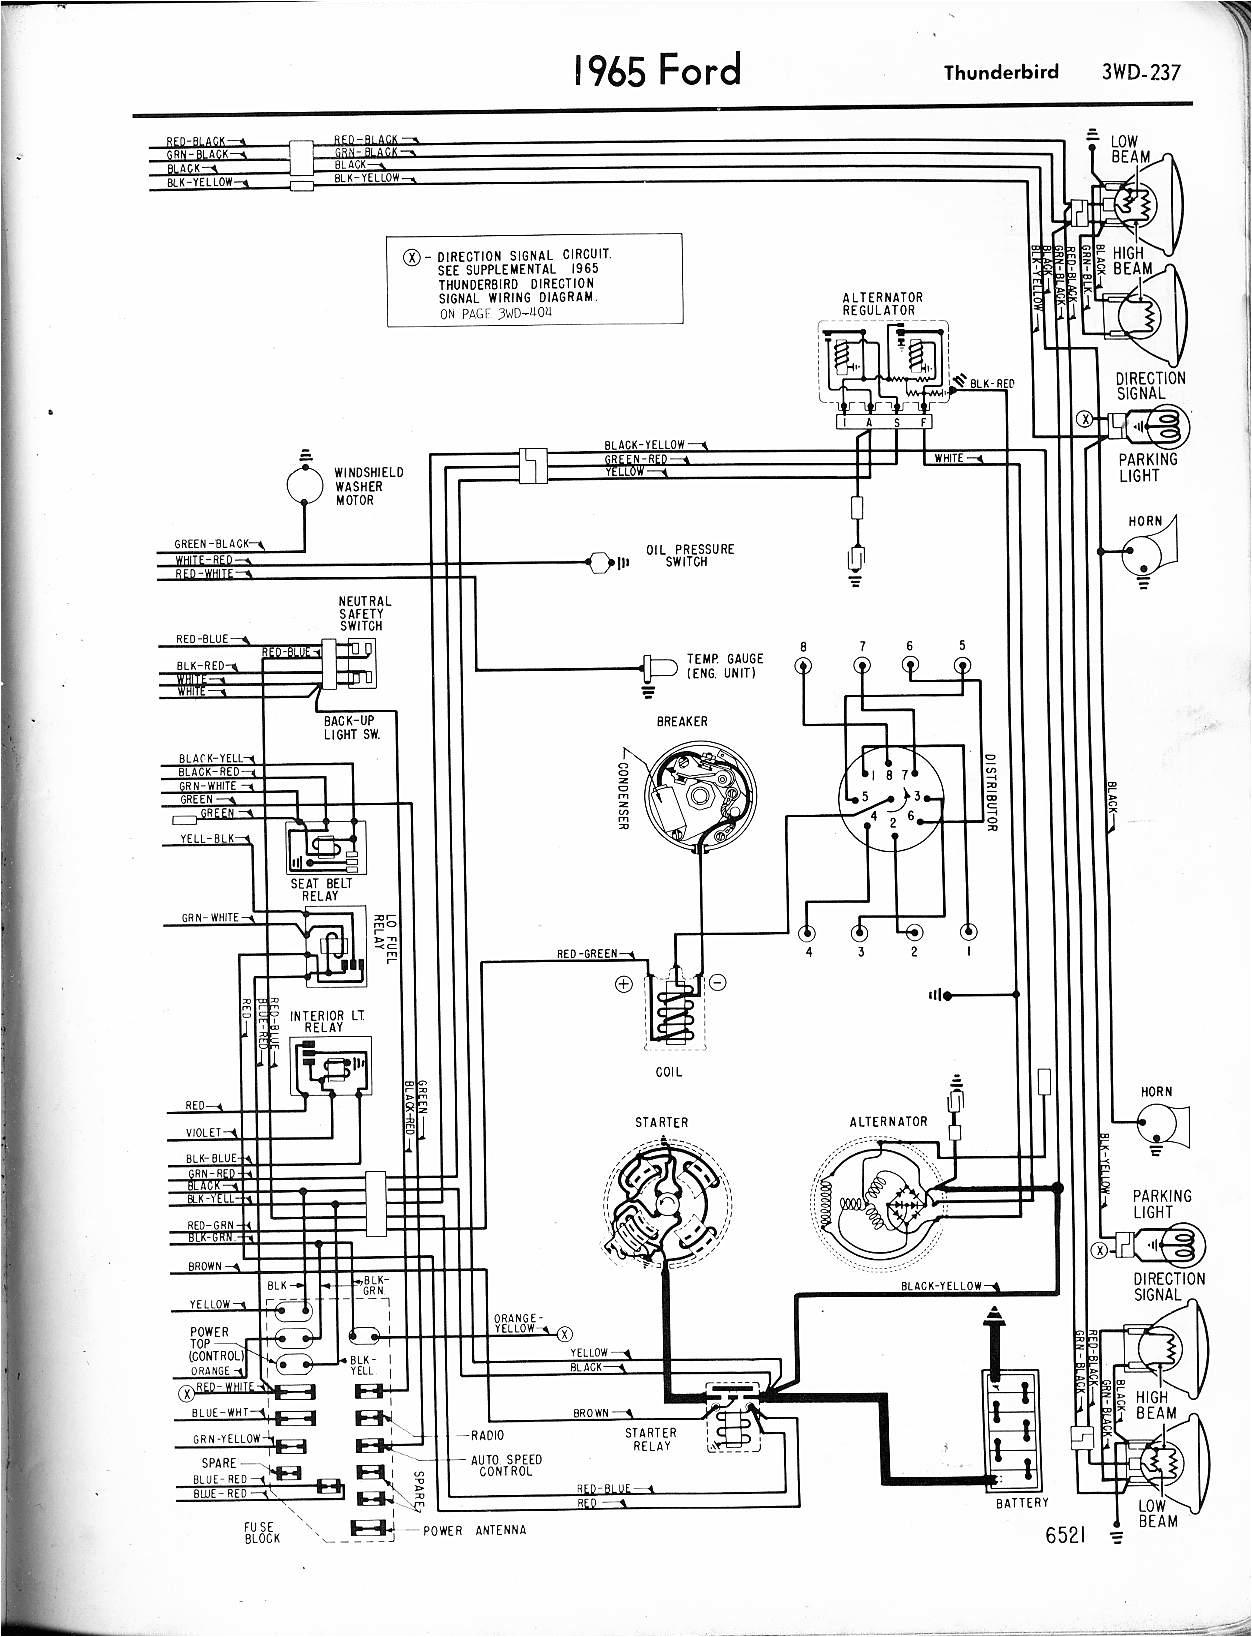 2003 ford f250 fuse box diagram beautiful 1966 ford f100 wire diagram jpg